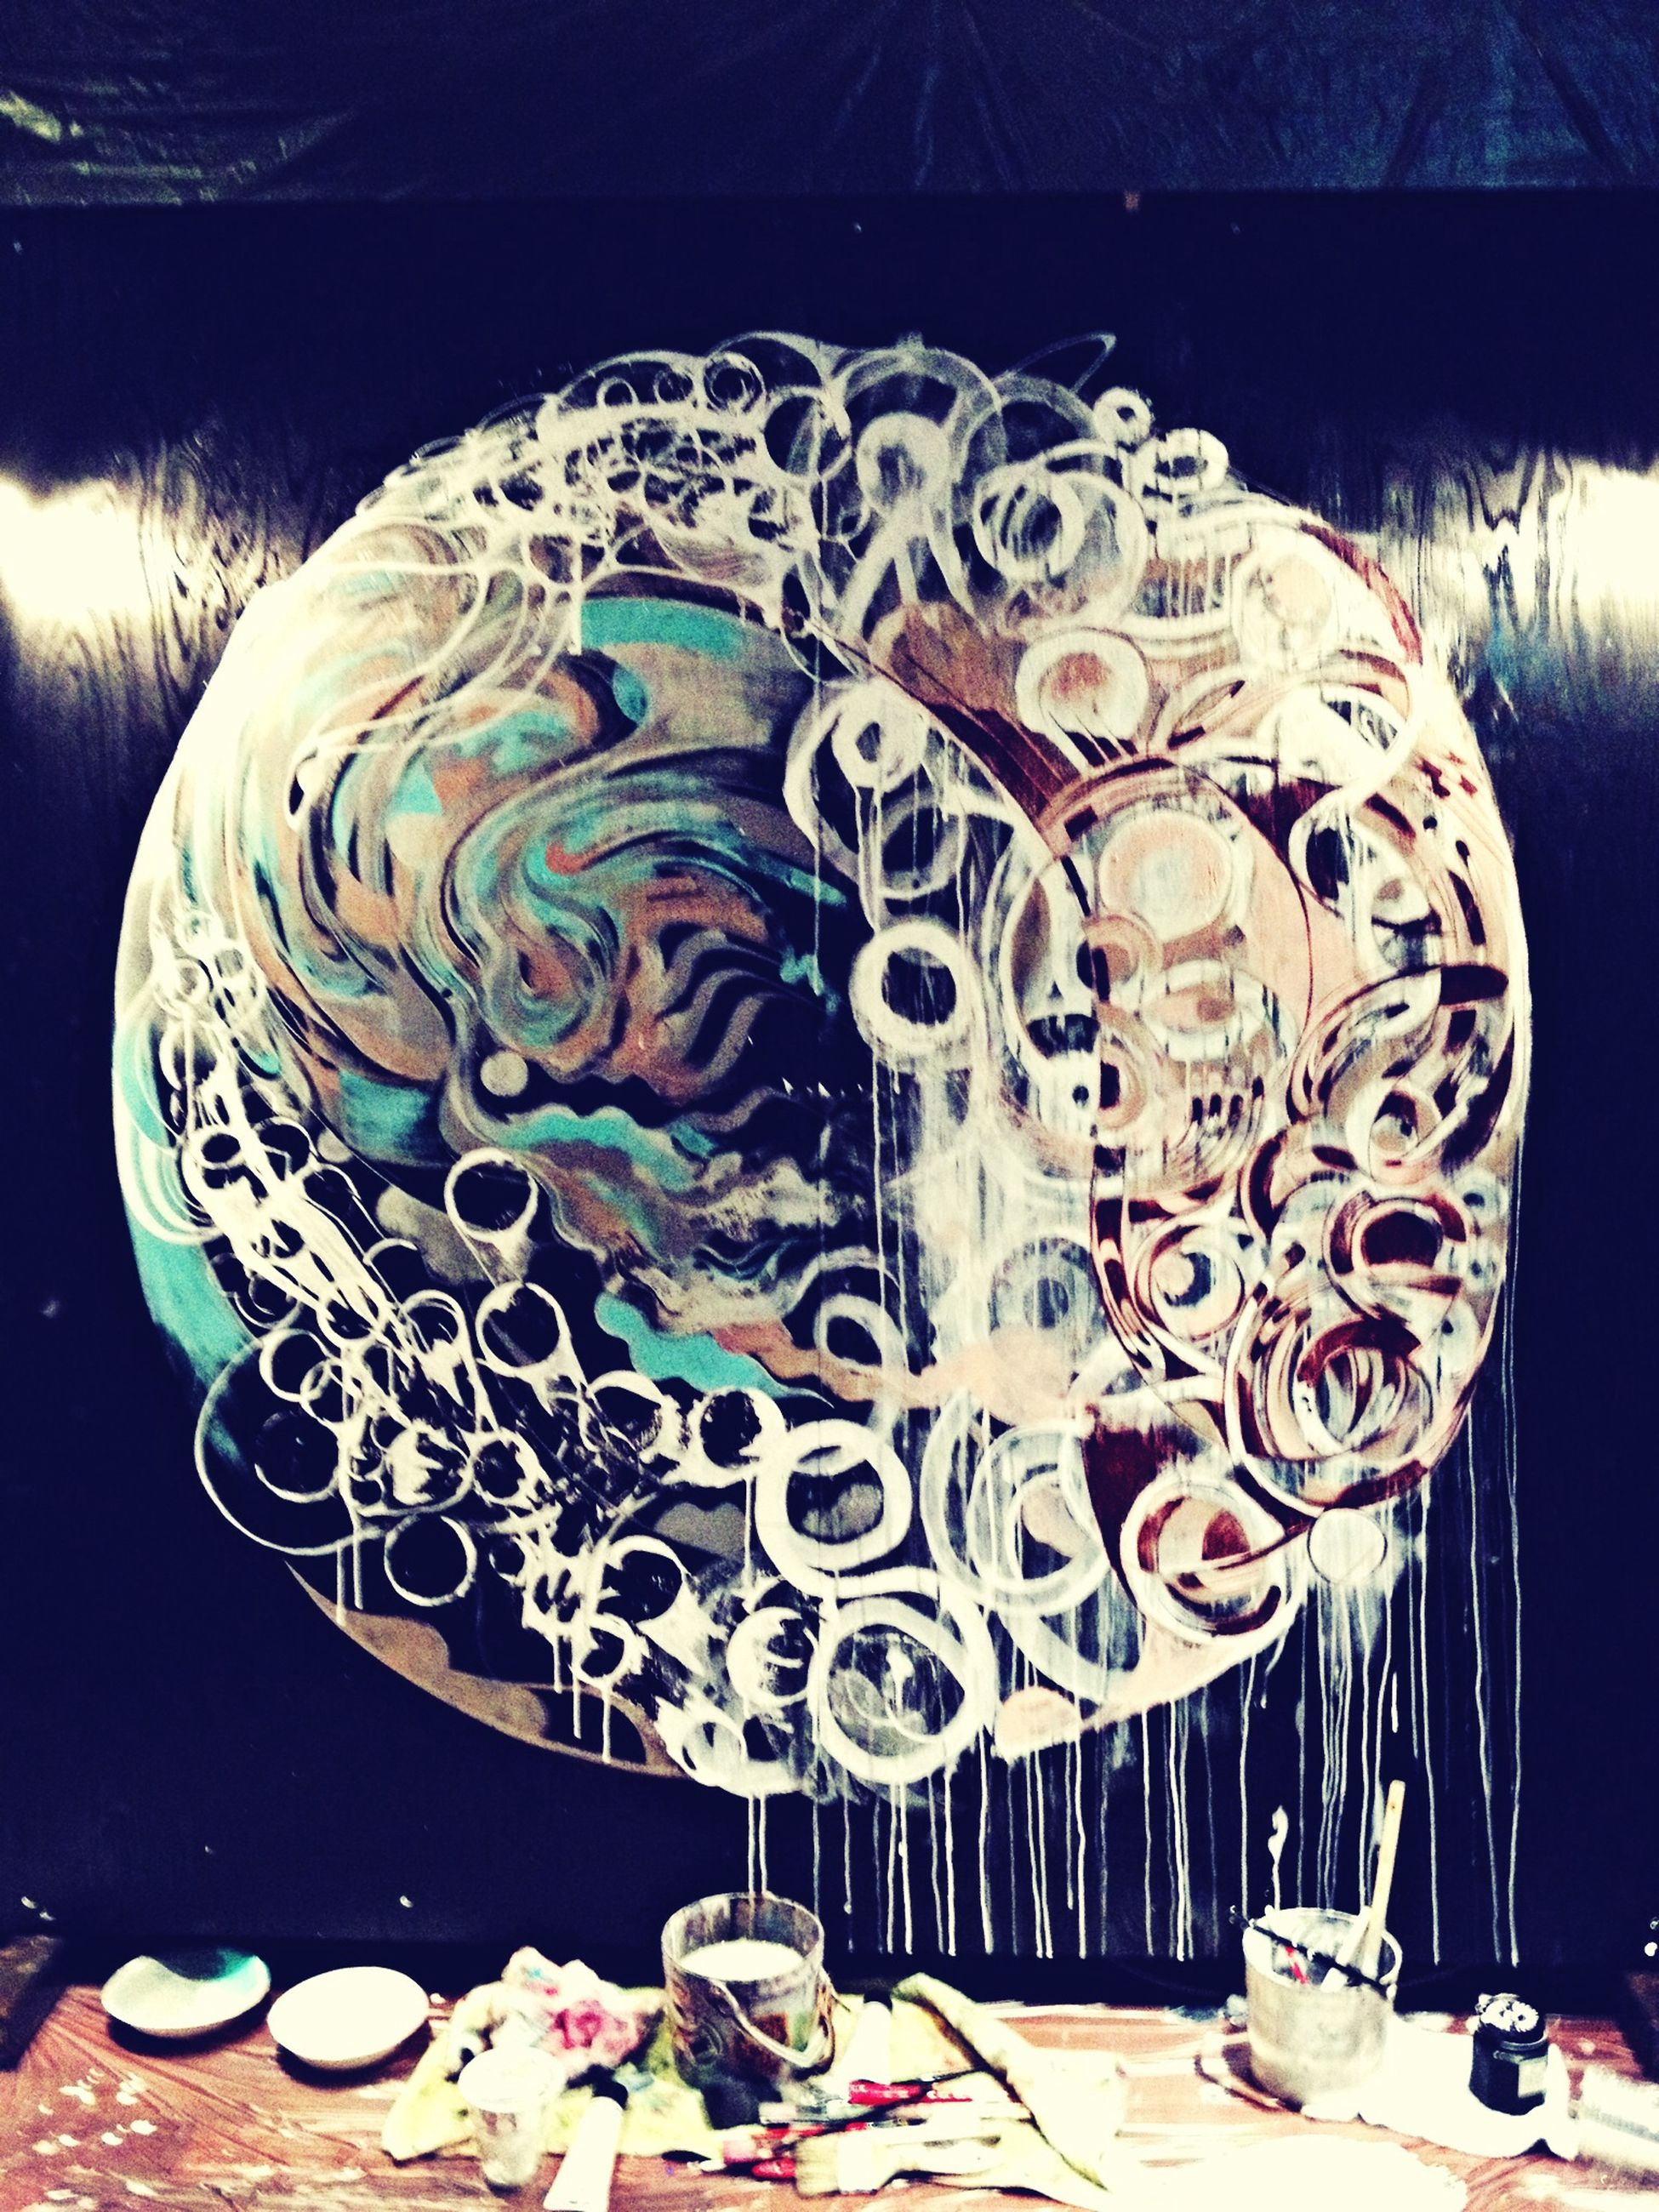 creativity, art, art and craft, animal representation, multi colored, human representation, decoration, craft, indoors, graffiti, design, celebration, amusement park, no people, arts culture and entertainment, sculpture, pattern, day